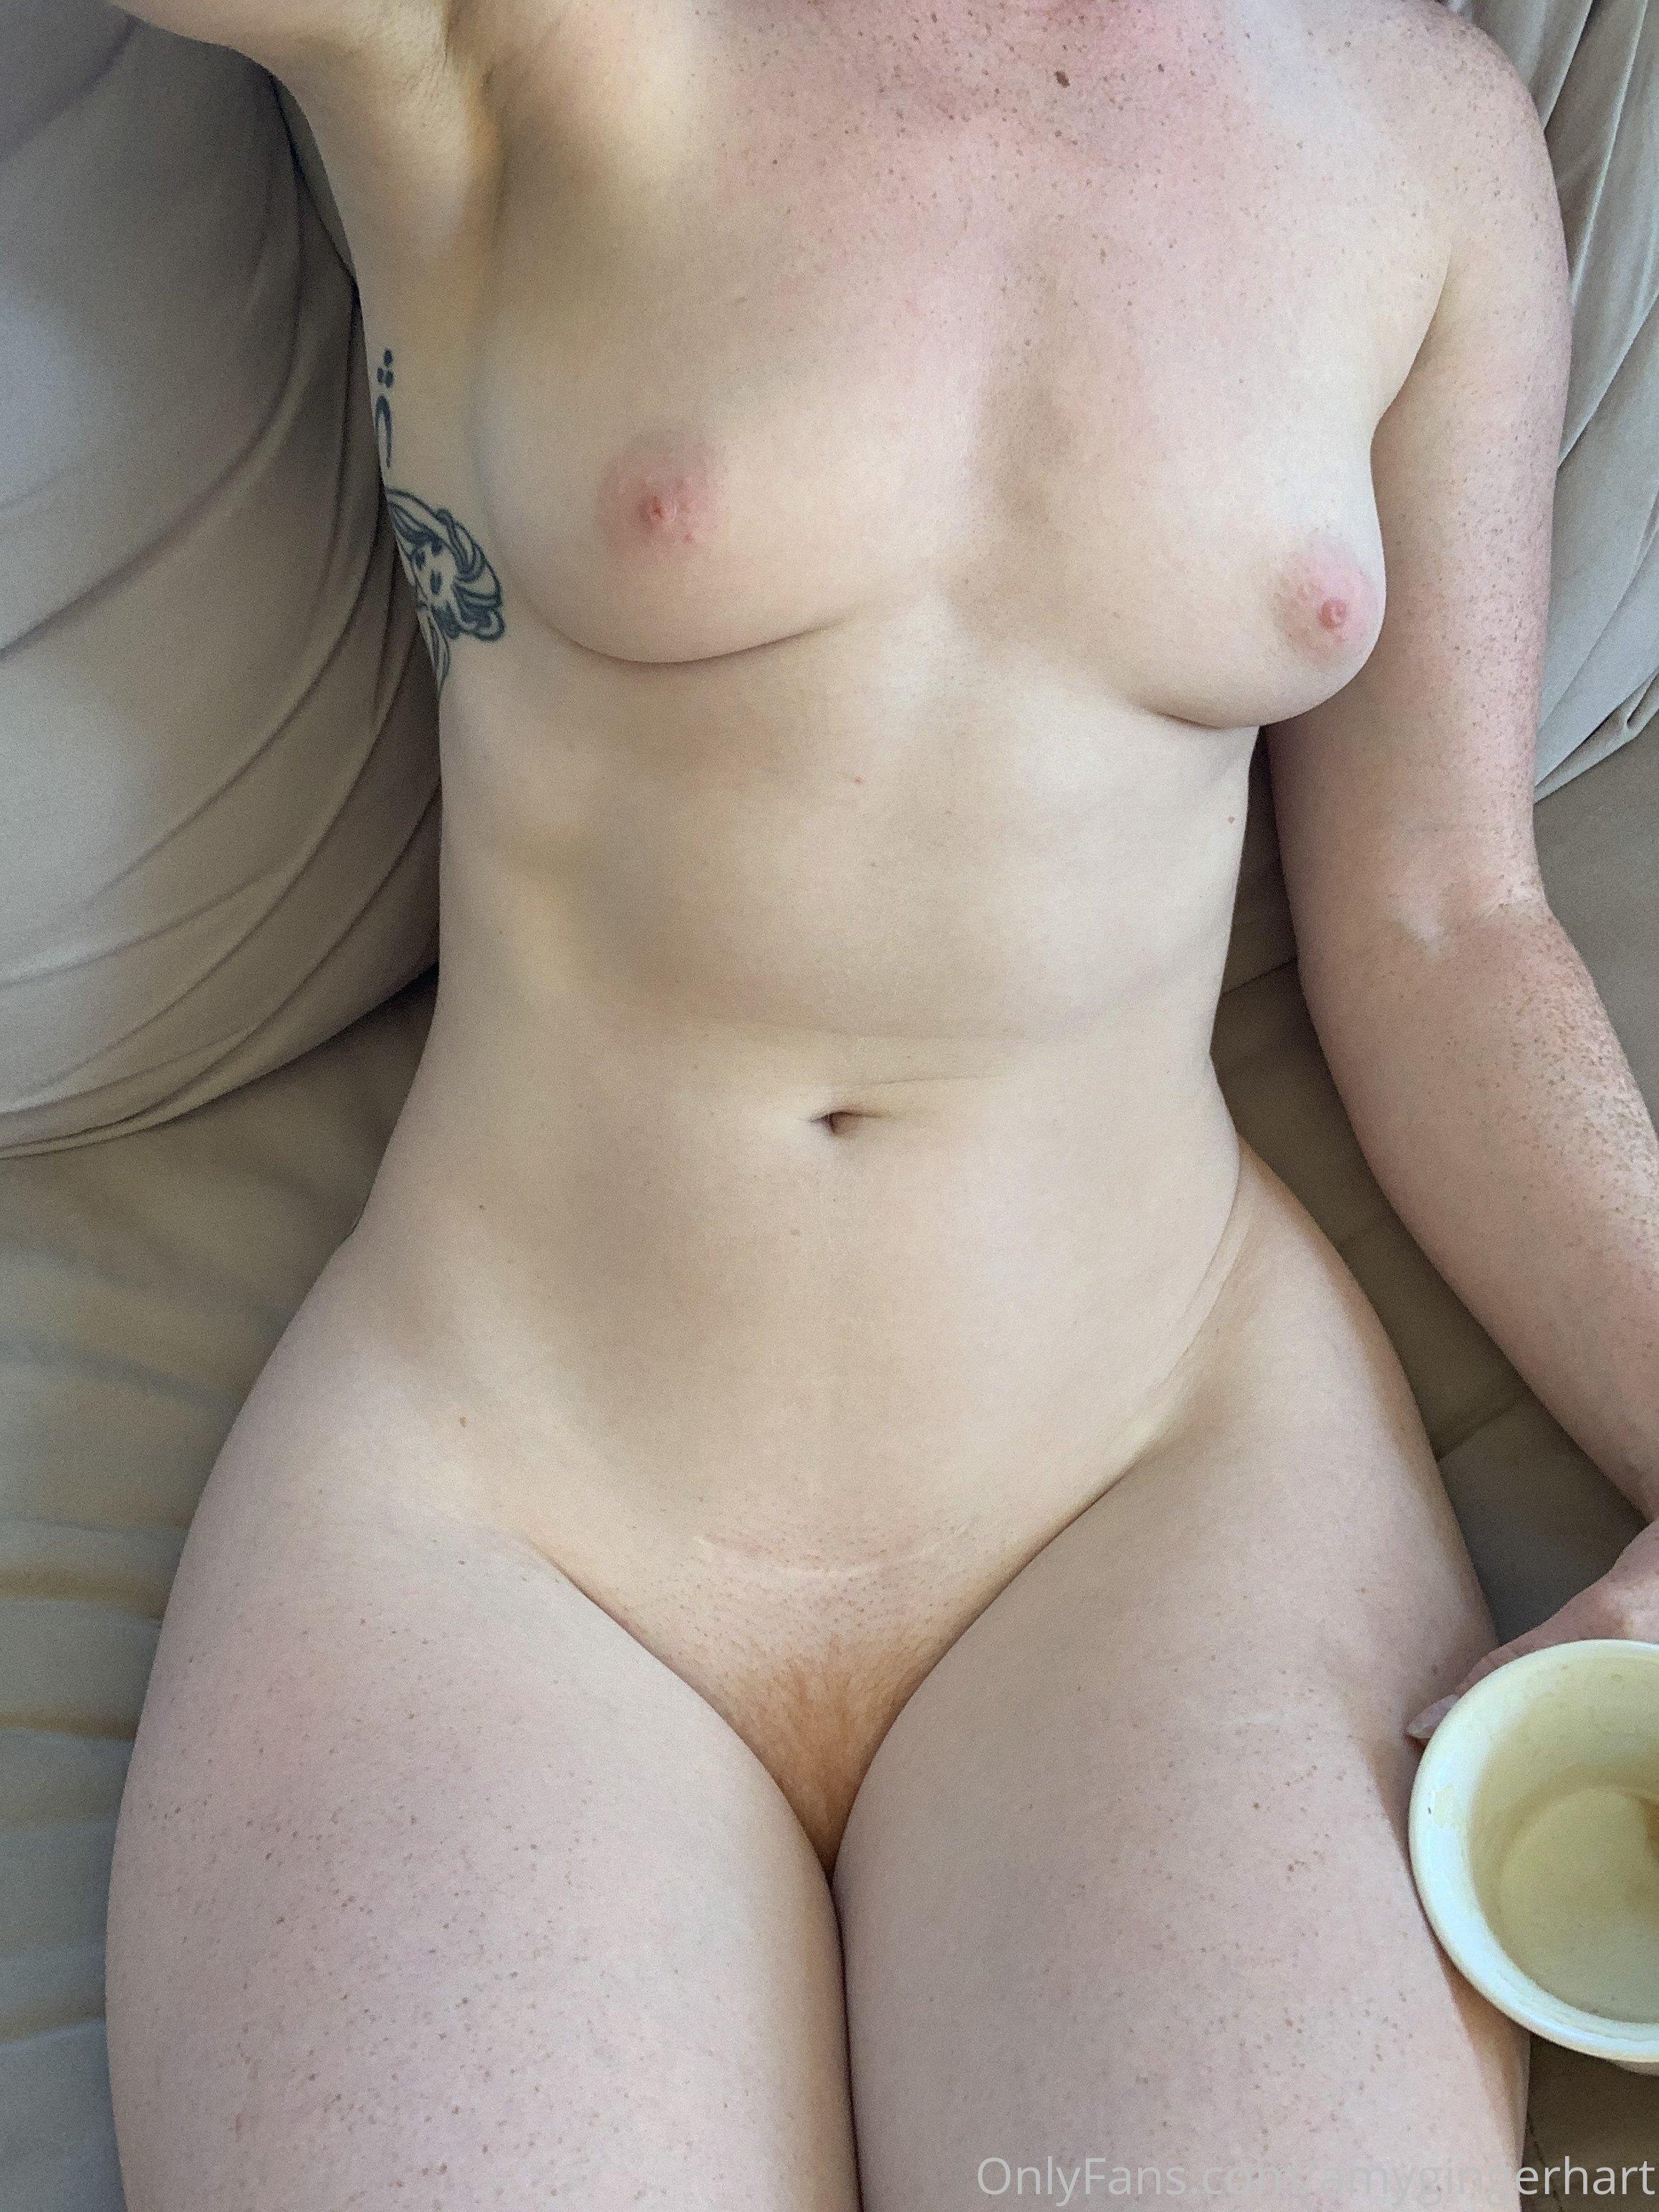 Amy Hart, Amygingerhart, Onlyfans 0277